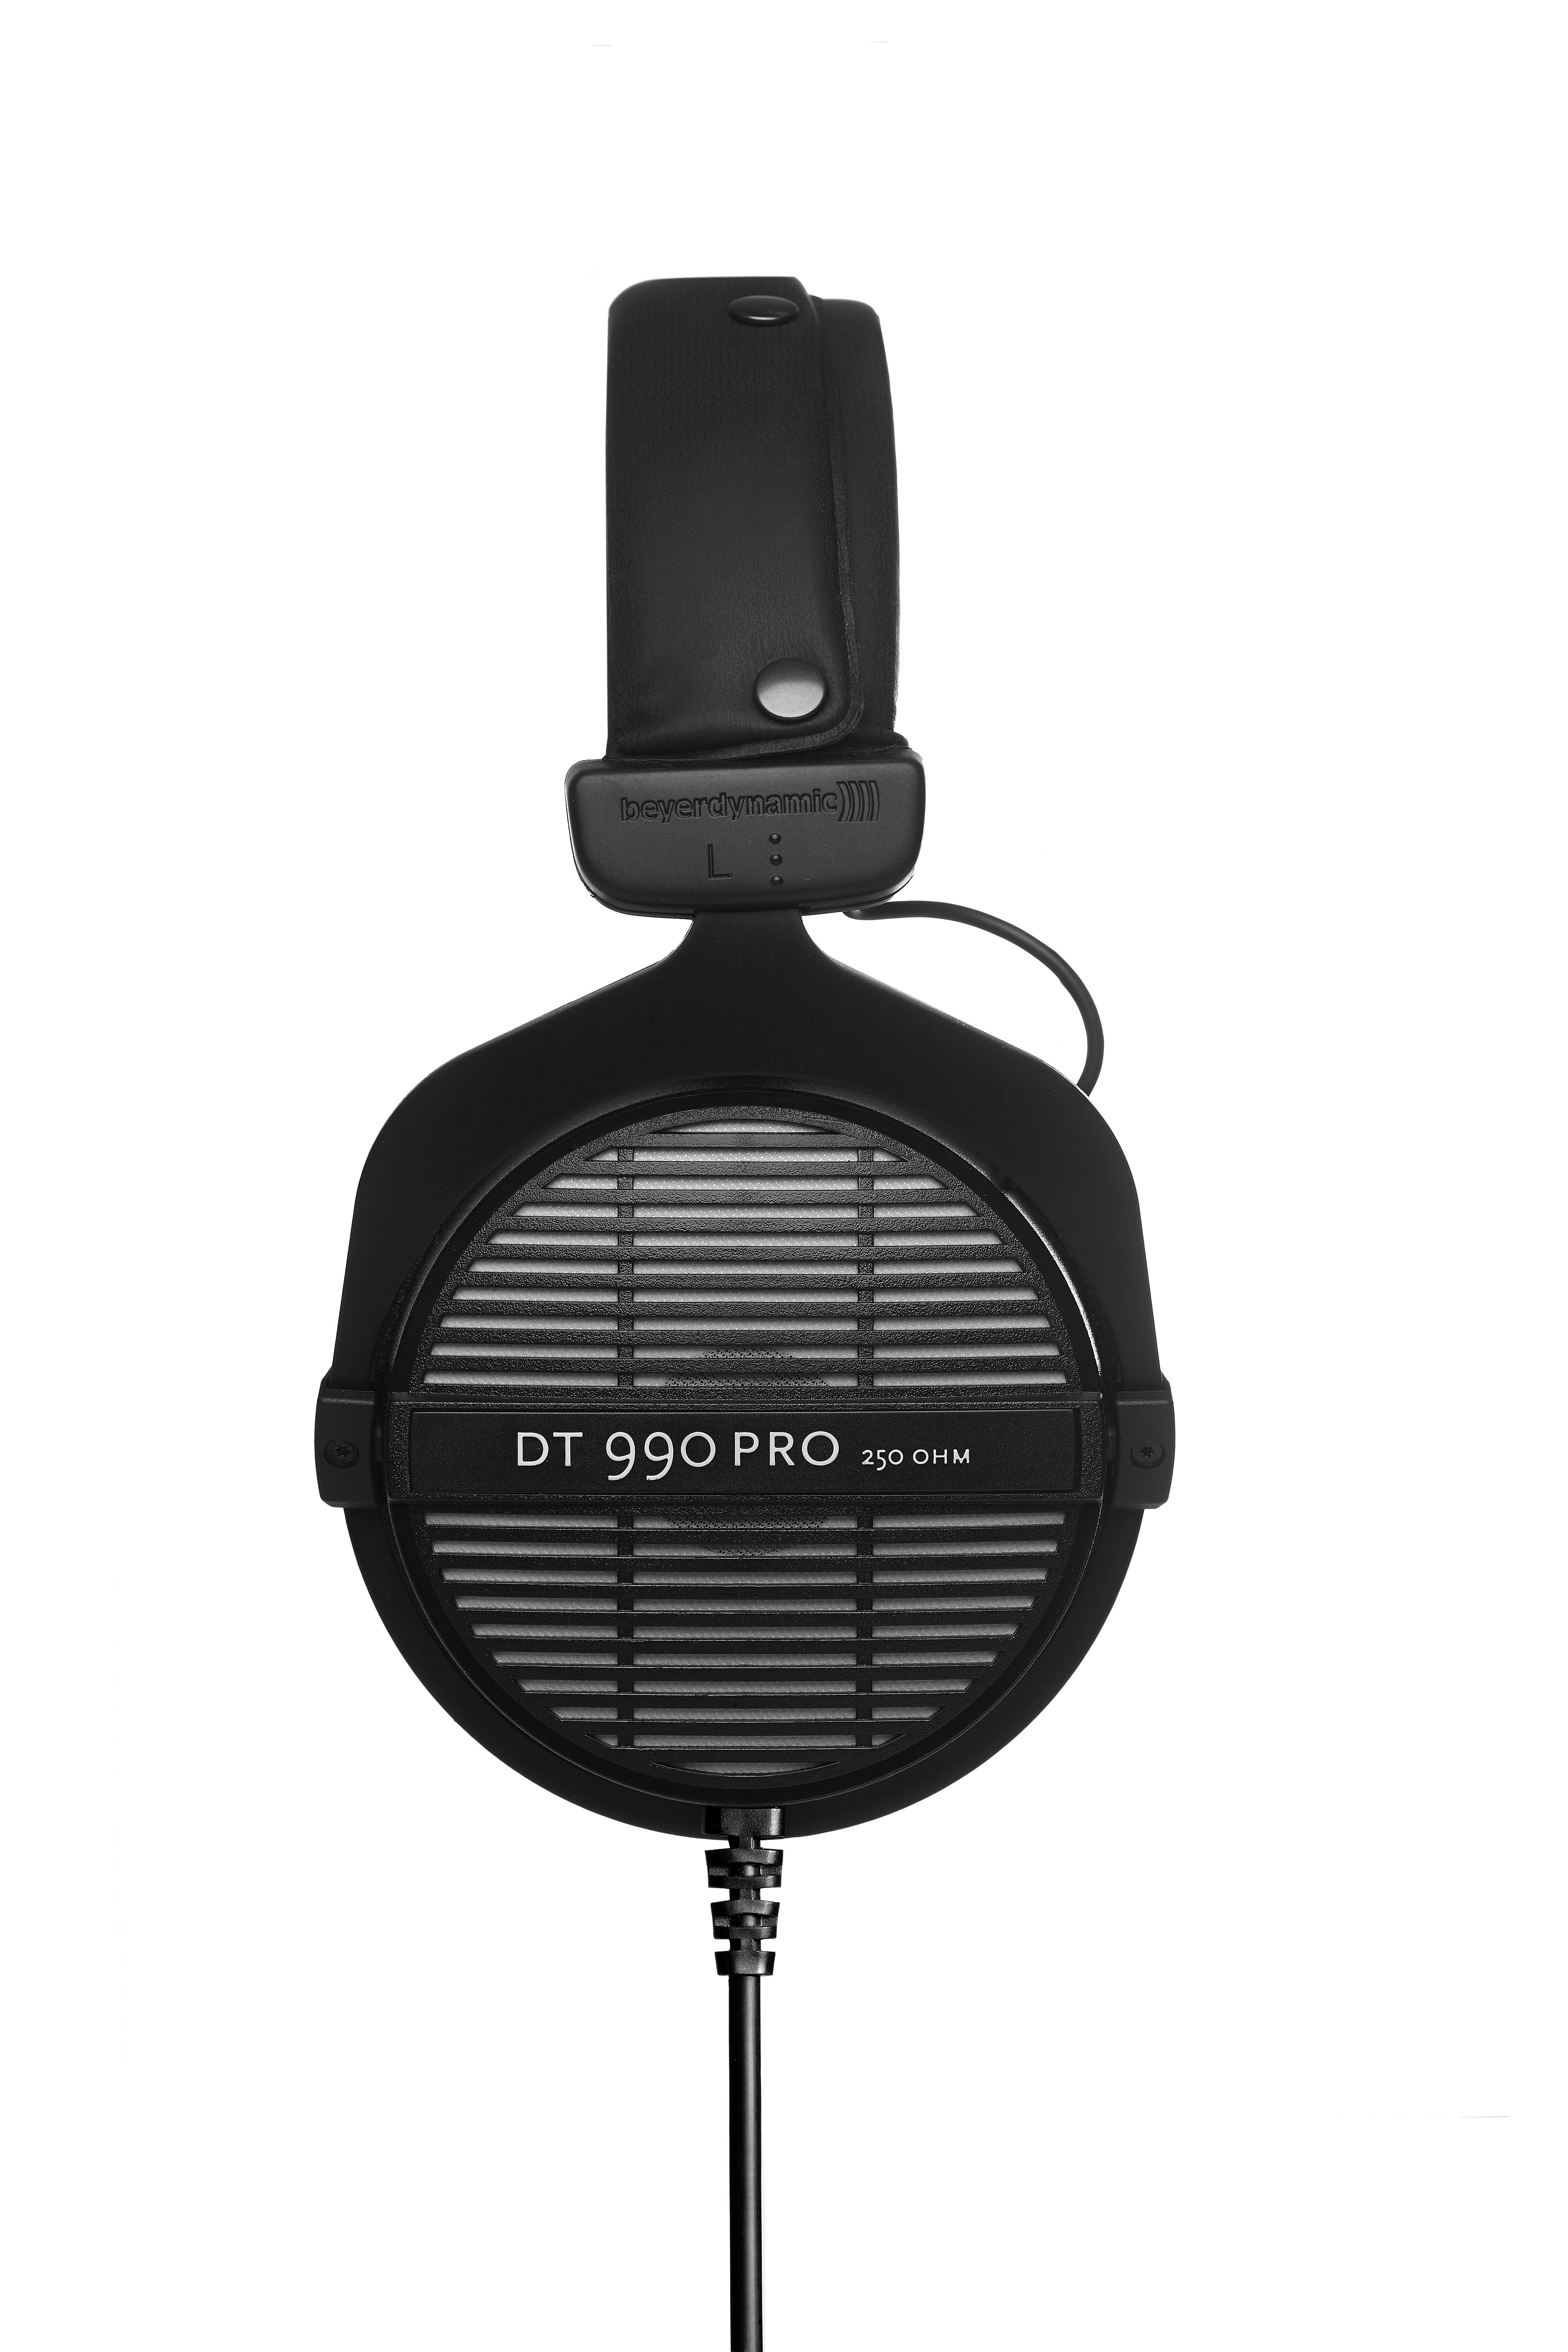 how to drive 250 ohm headphones